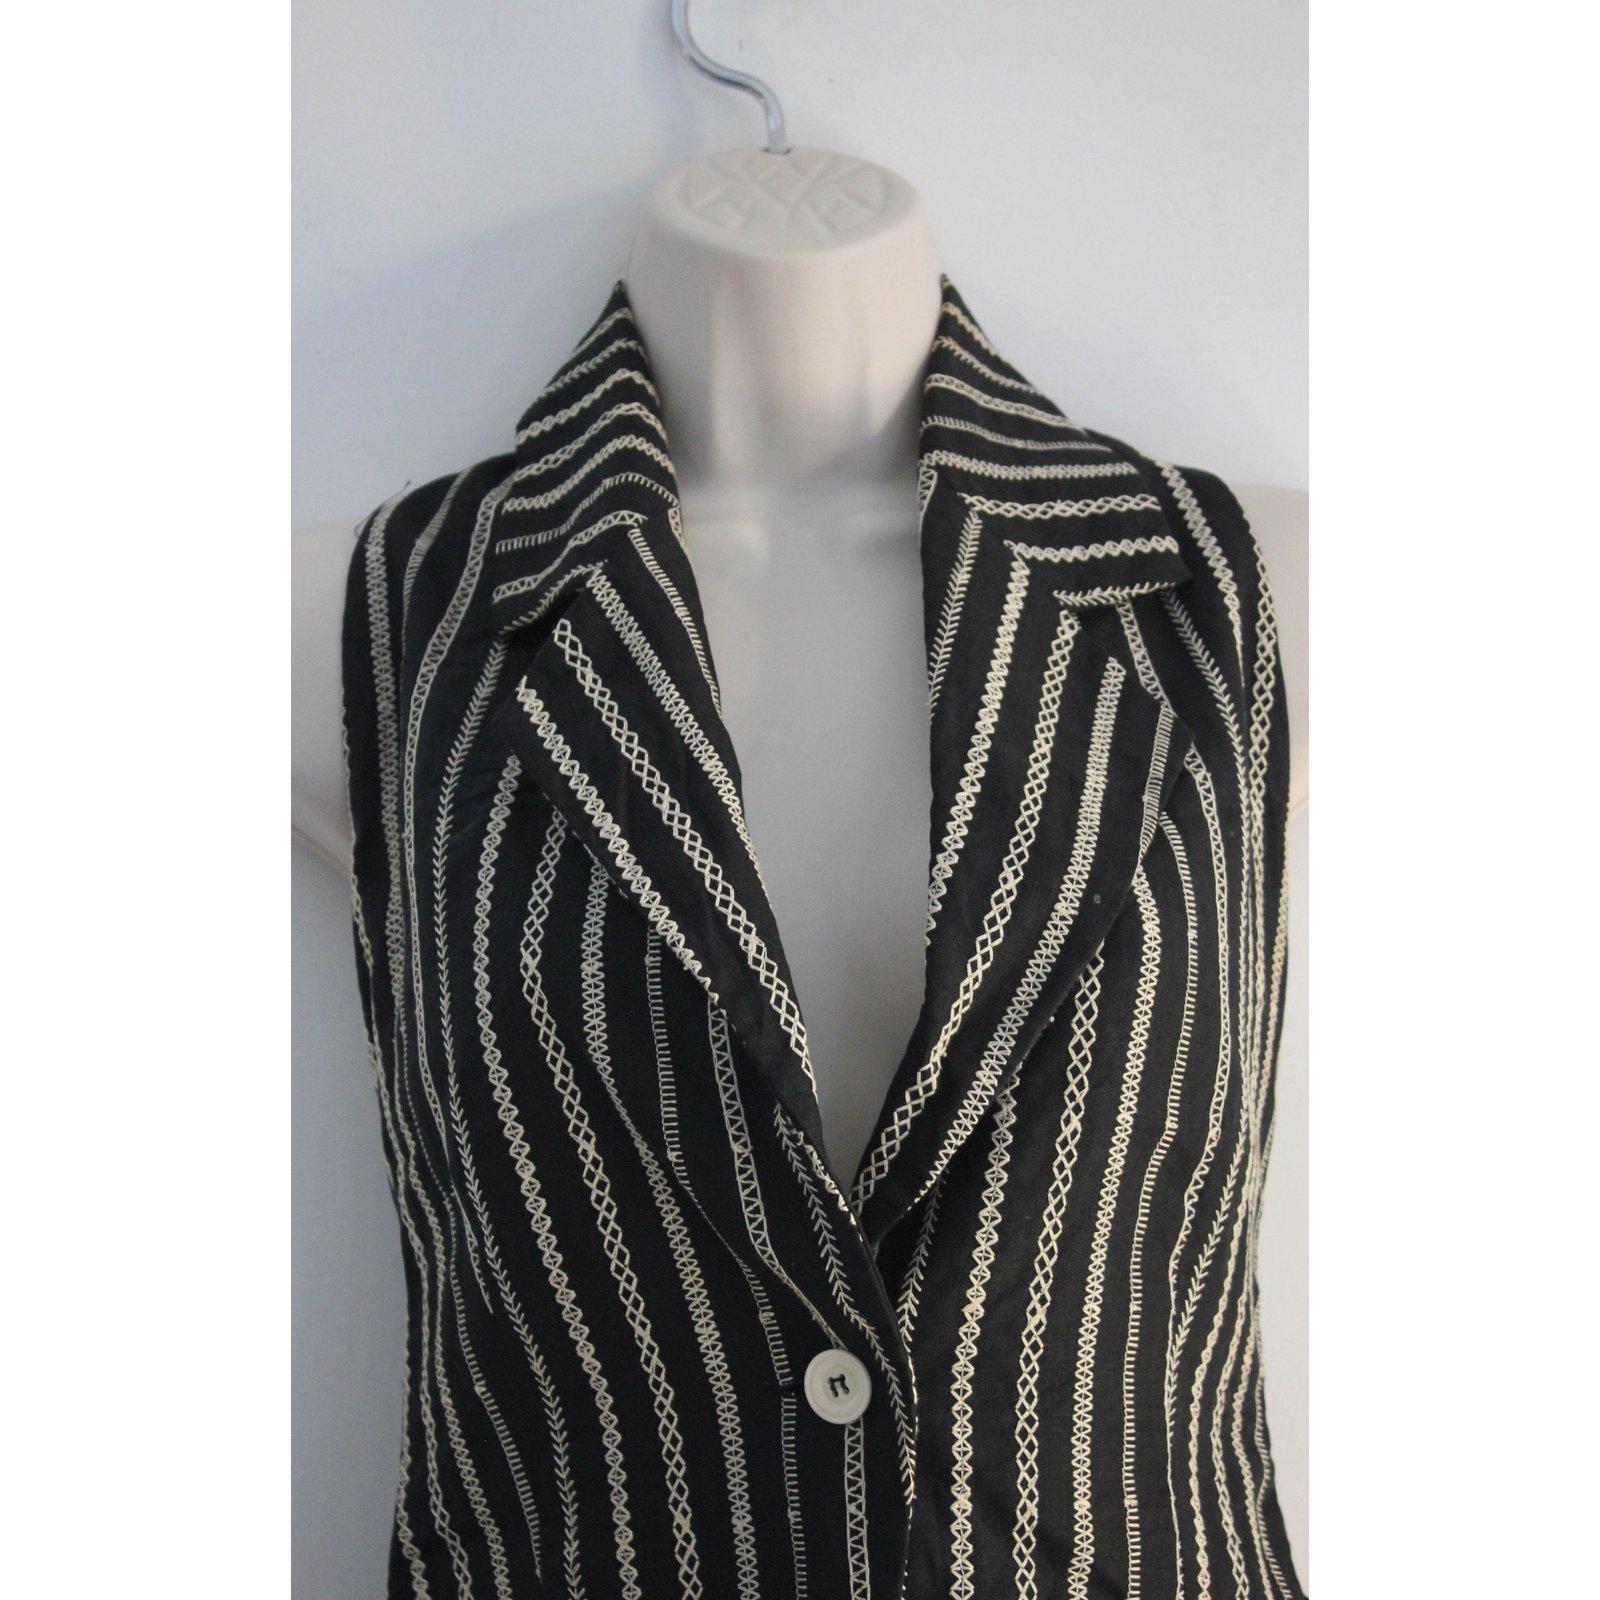 Vestes Joli Byblos Coton Closet blanc 50908 Noir Ref 66rYqgw